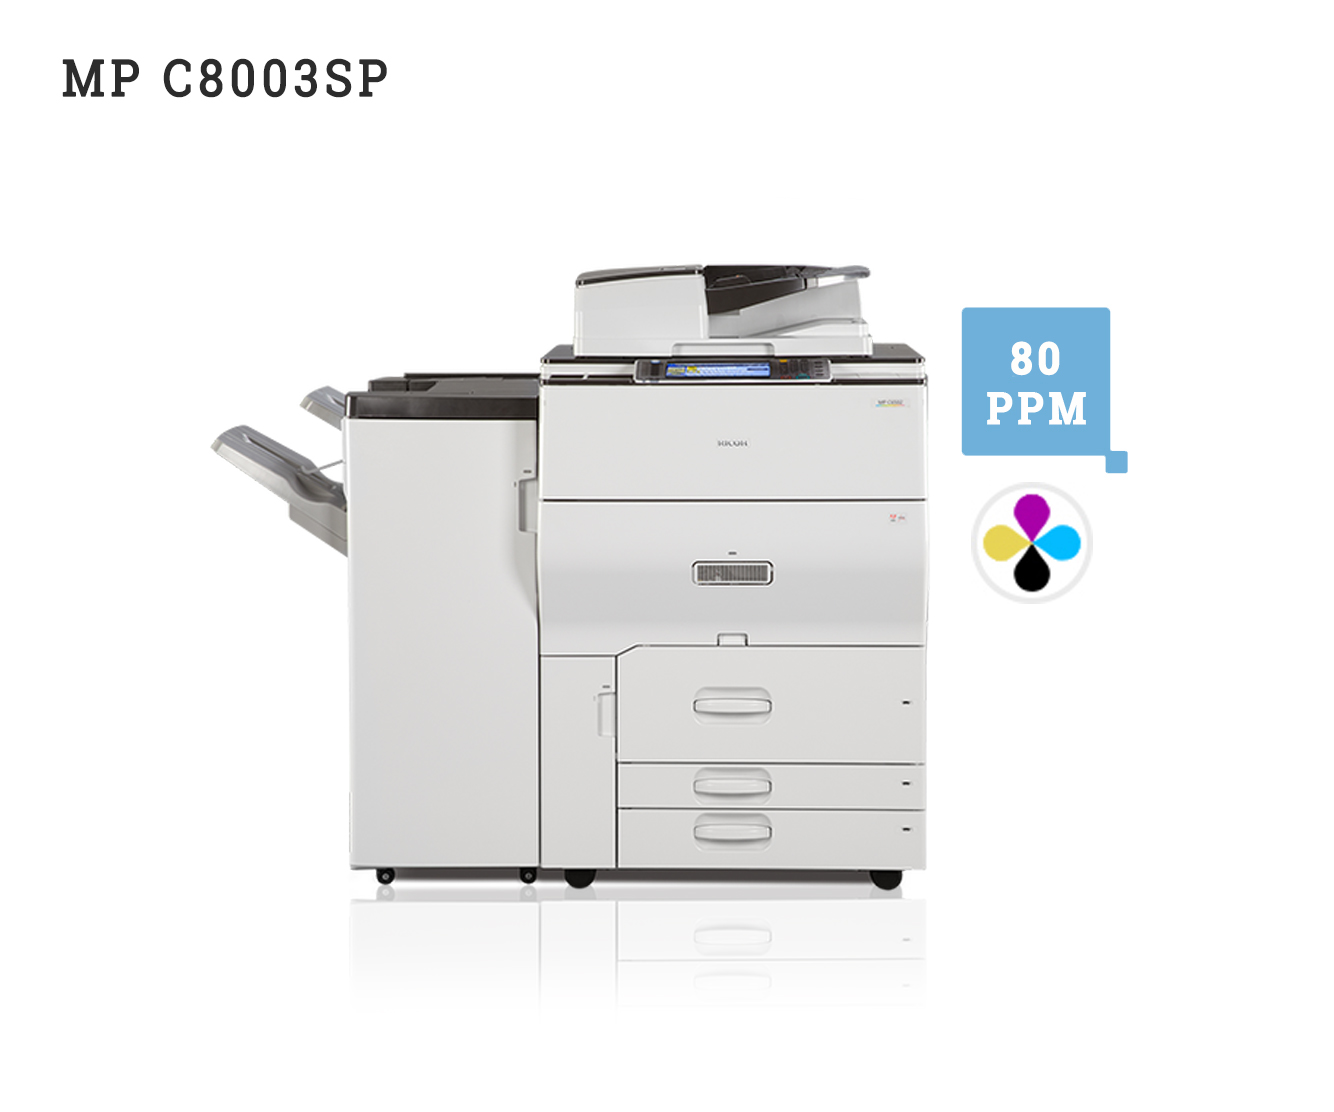 mpc8003